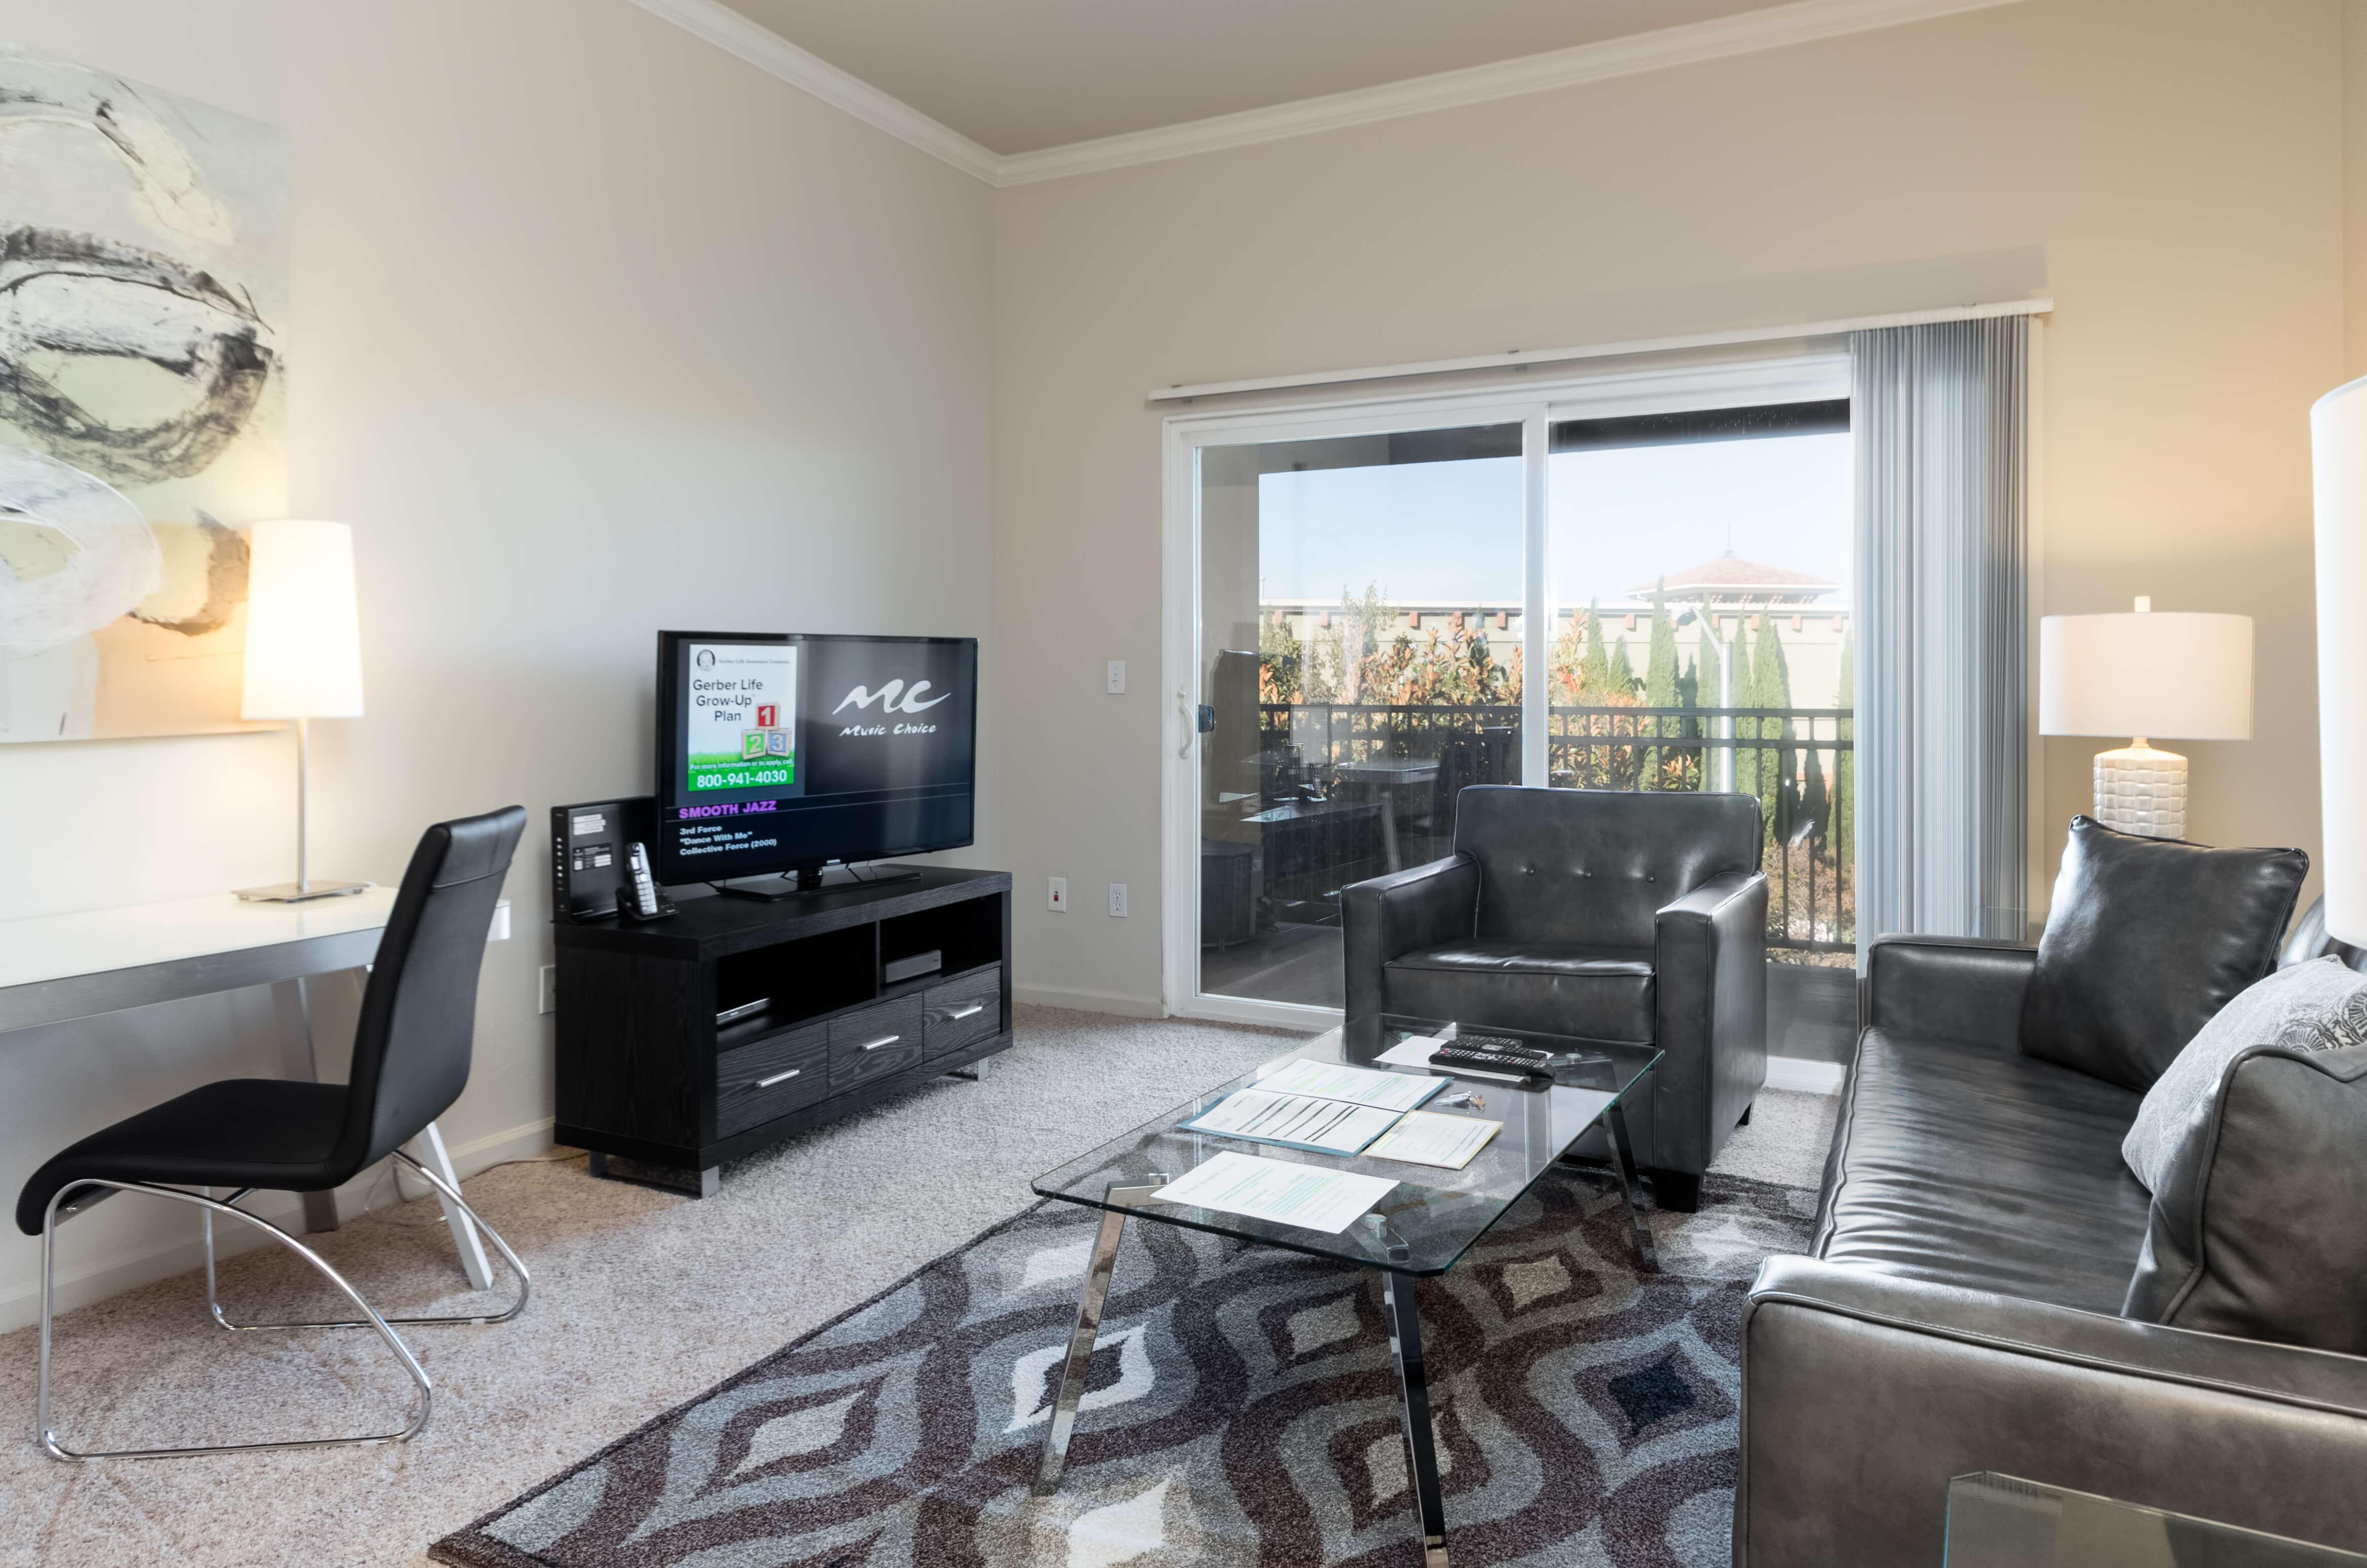 image 8 furnished 3 bedroom Apartment for rent in Santa Clara, Santa Clara County